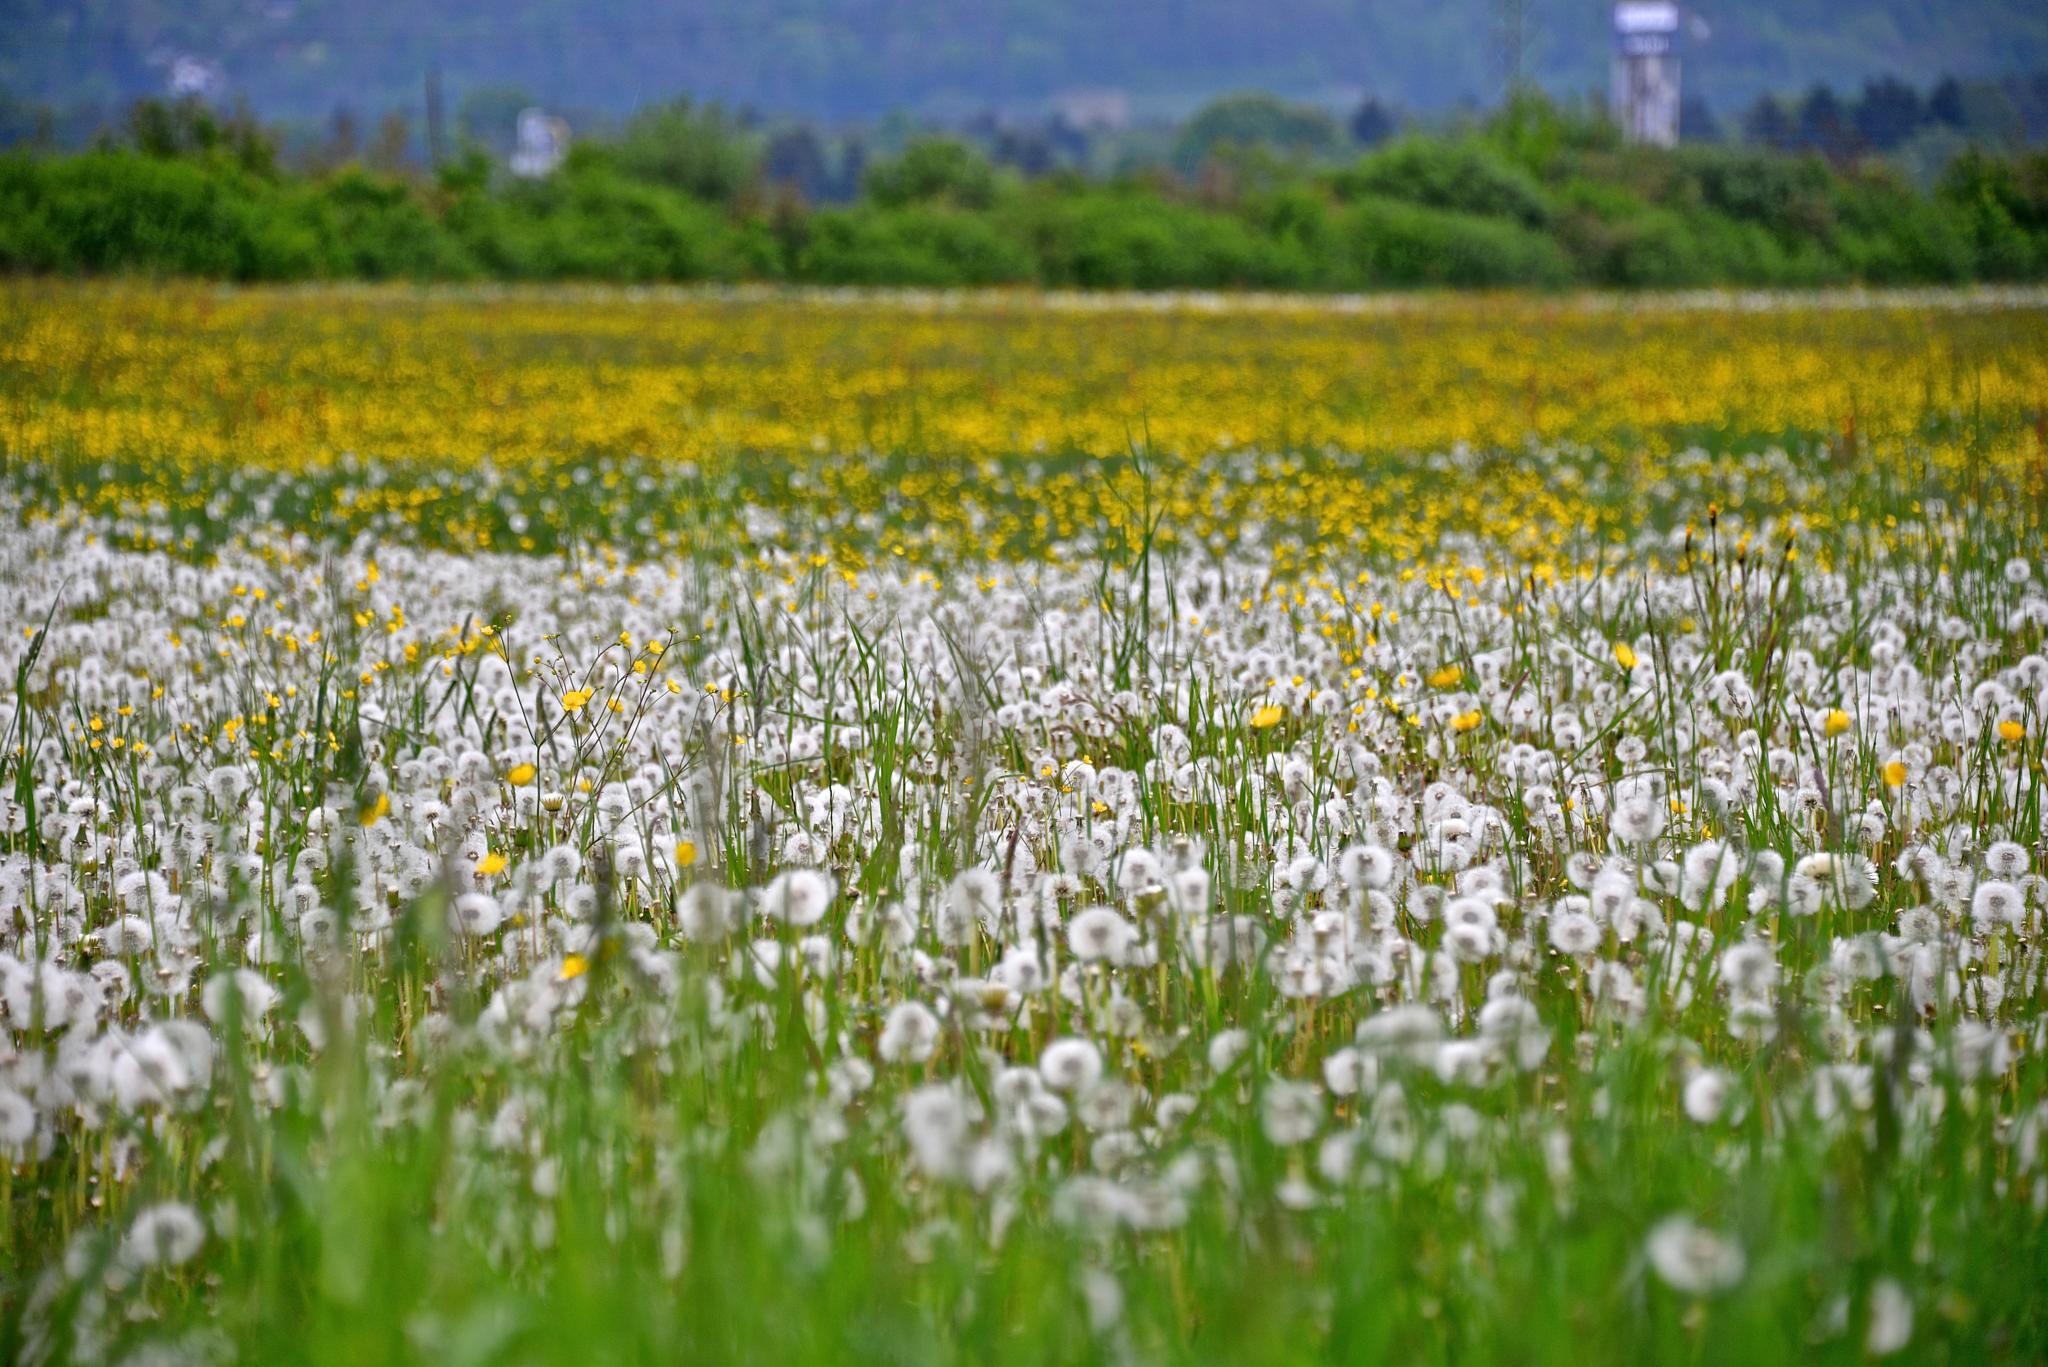 Taraxacum officinale, the common dandelion by Buki